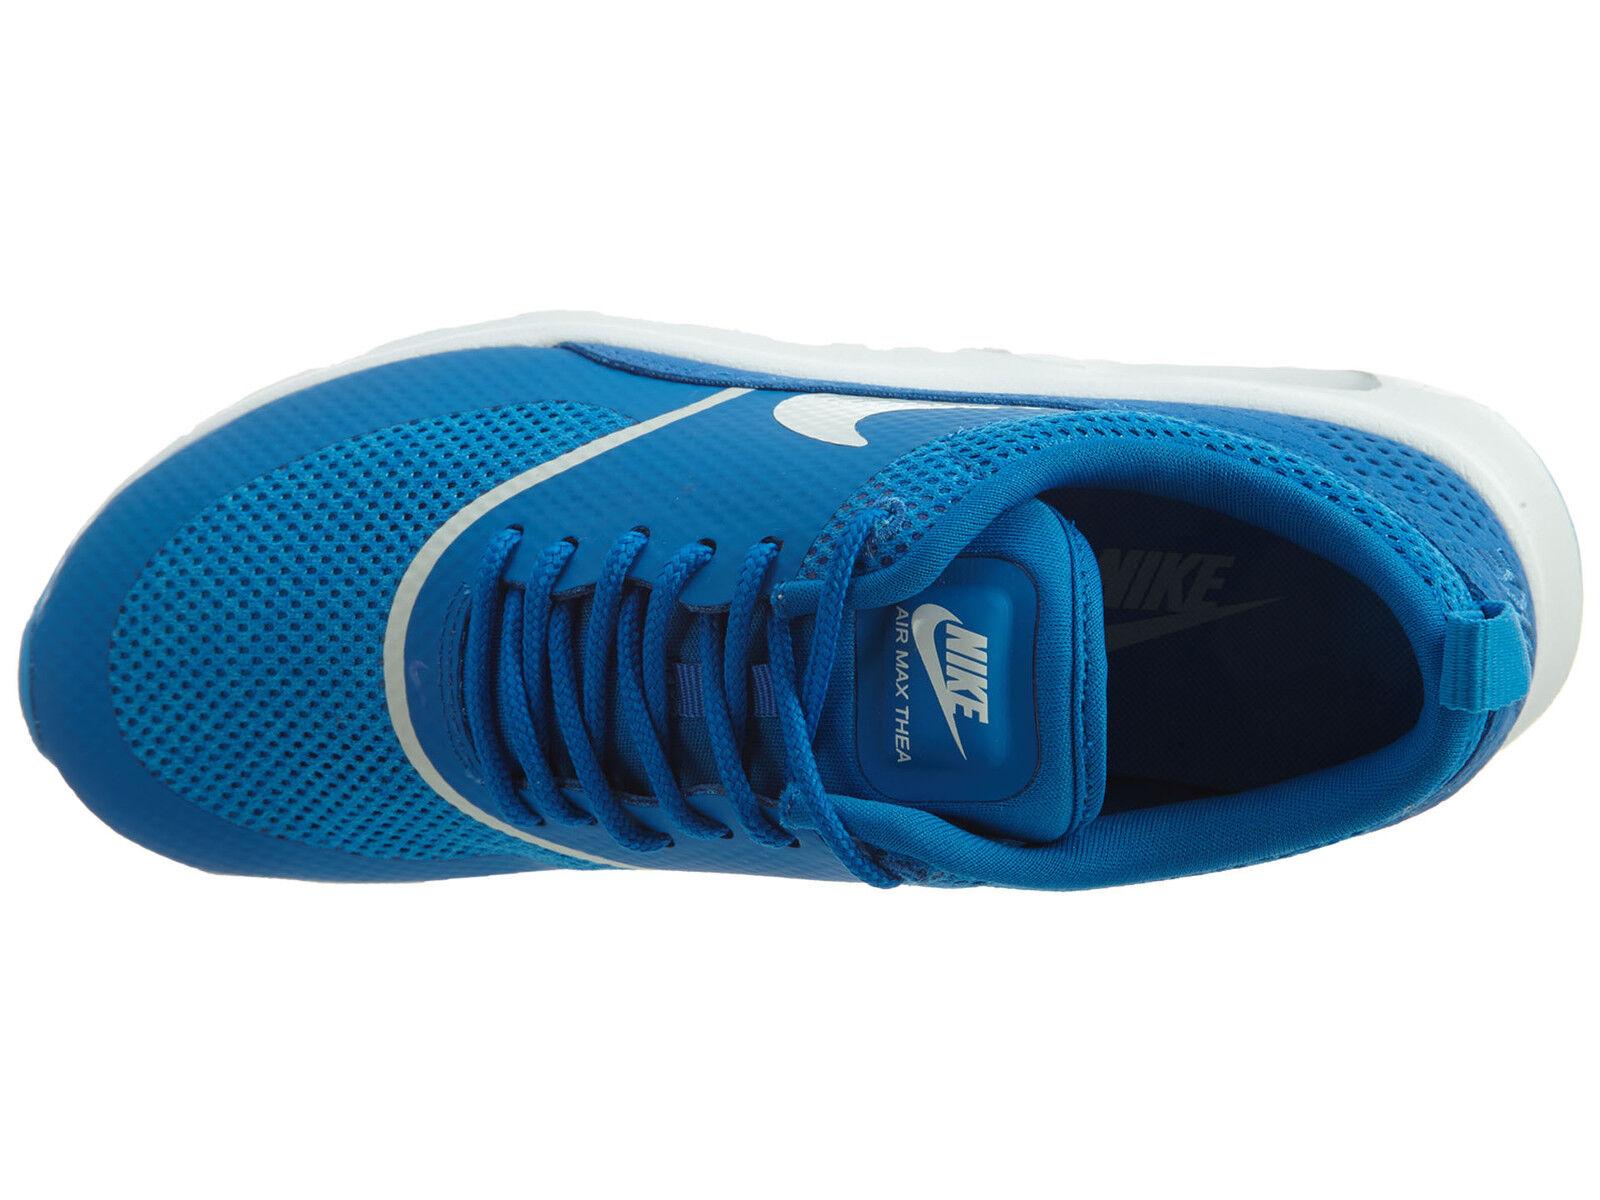 nike Bleu air max thea  s 599409-413 Bleu nike  spark brillent des espadrilles blanches de ta ille 6 af5a6d